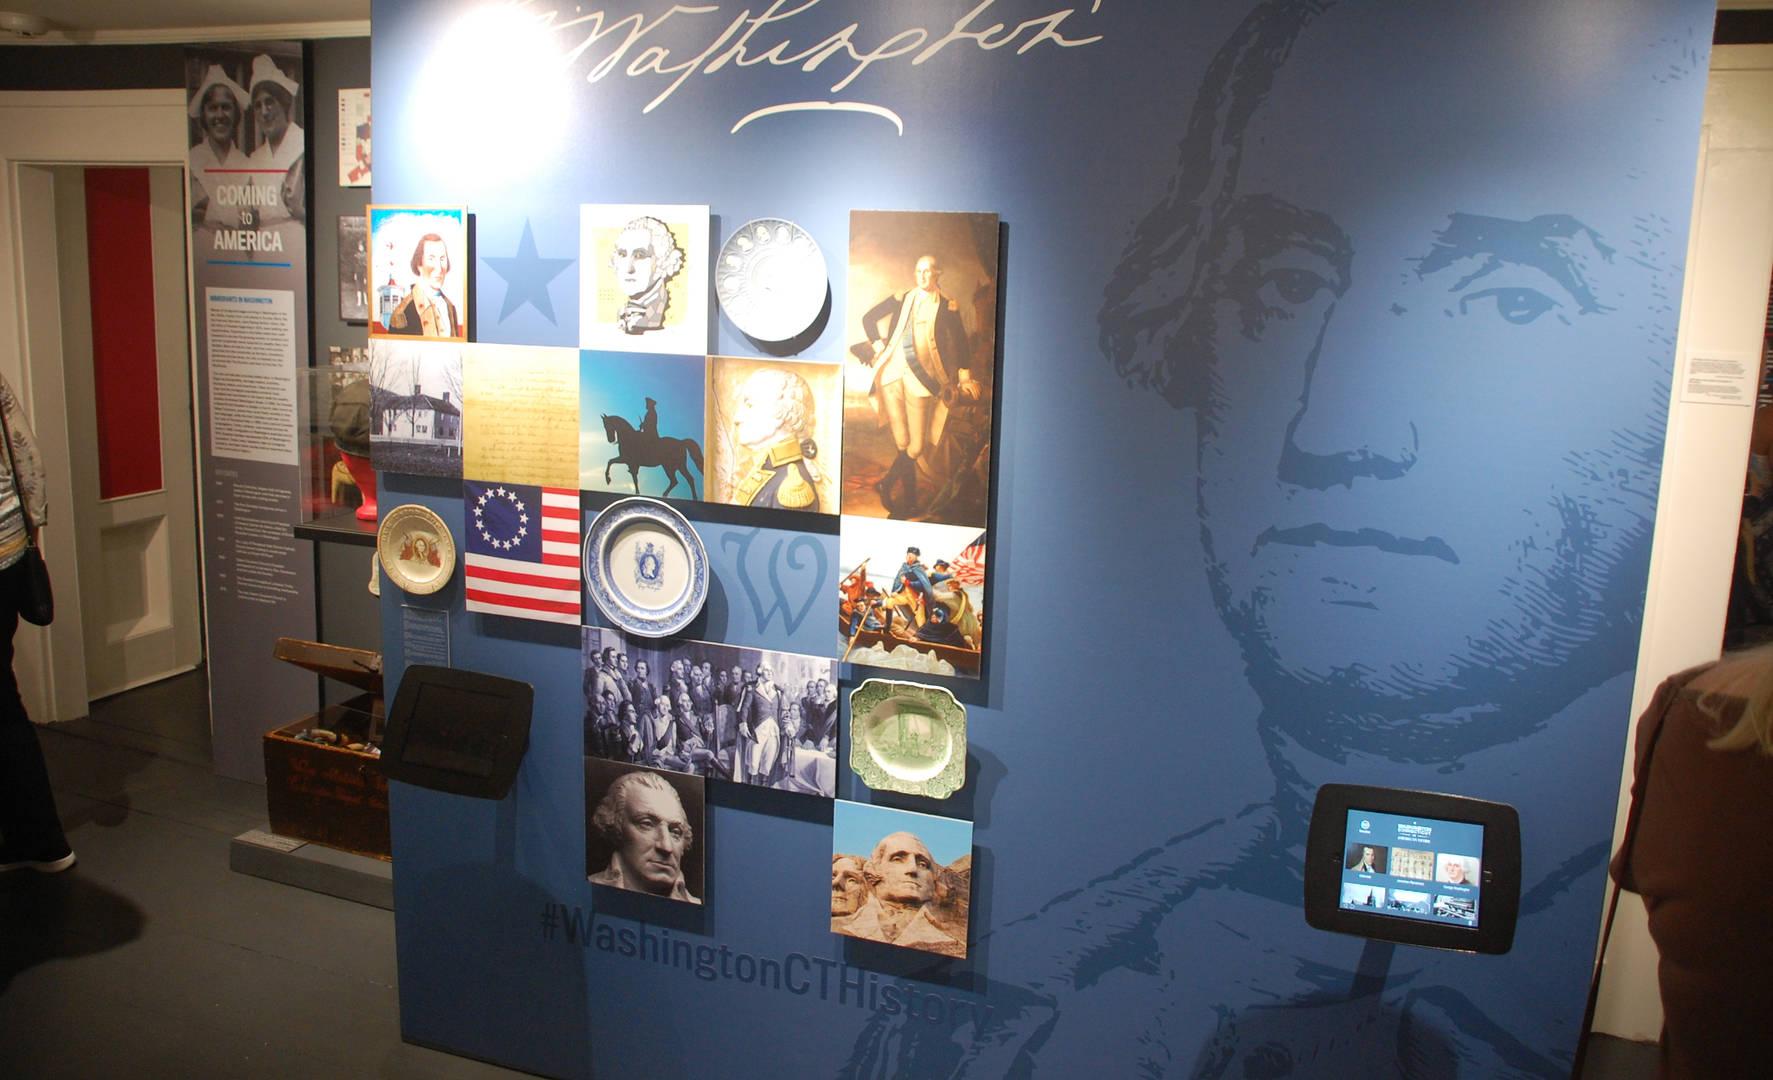 Washington CT Historical Museum